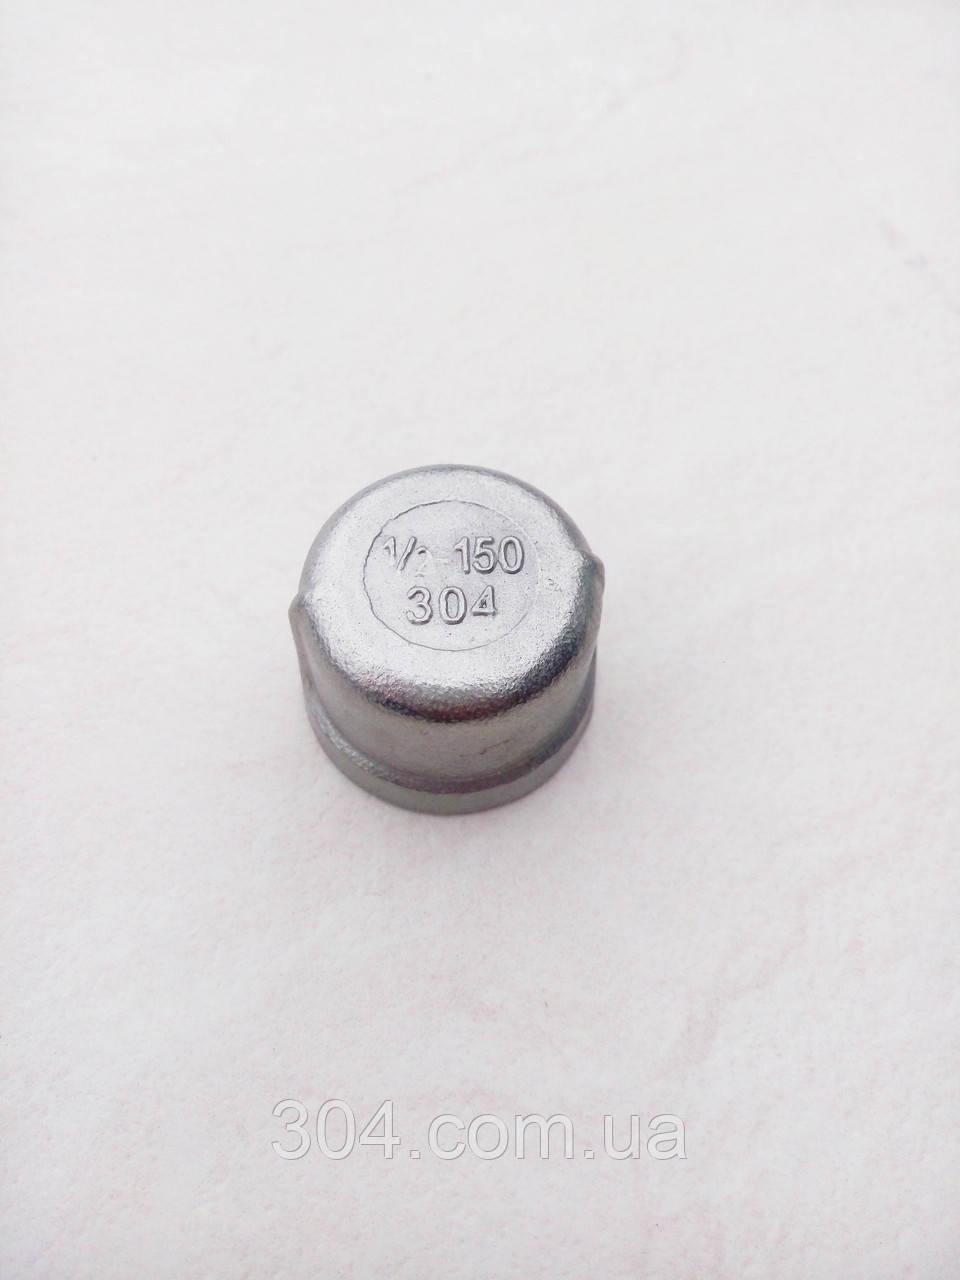 Заглушка нержавеющая Ду 25(1 дюйм), AISI 304